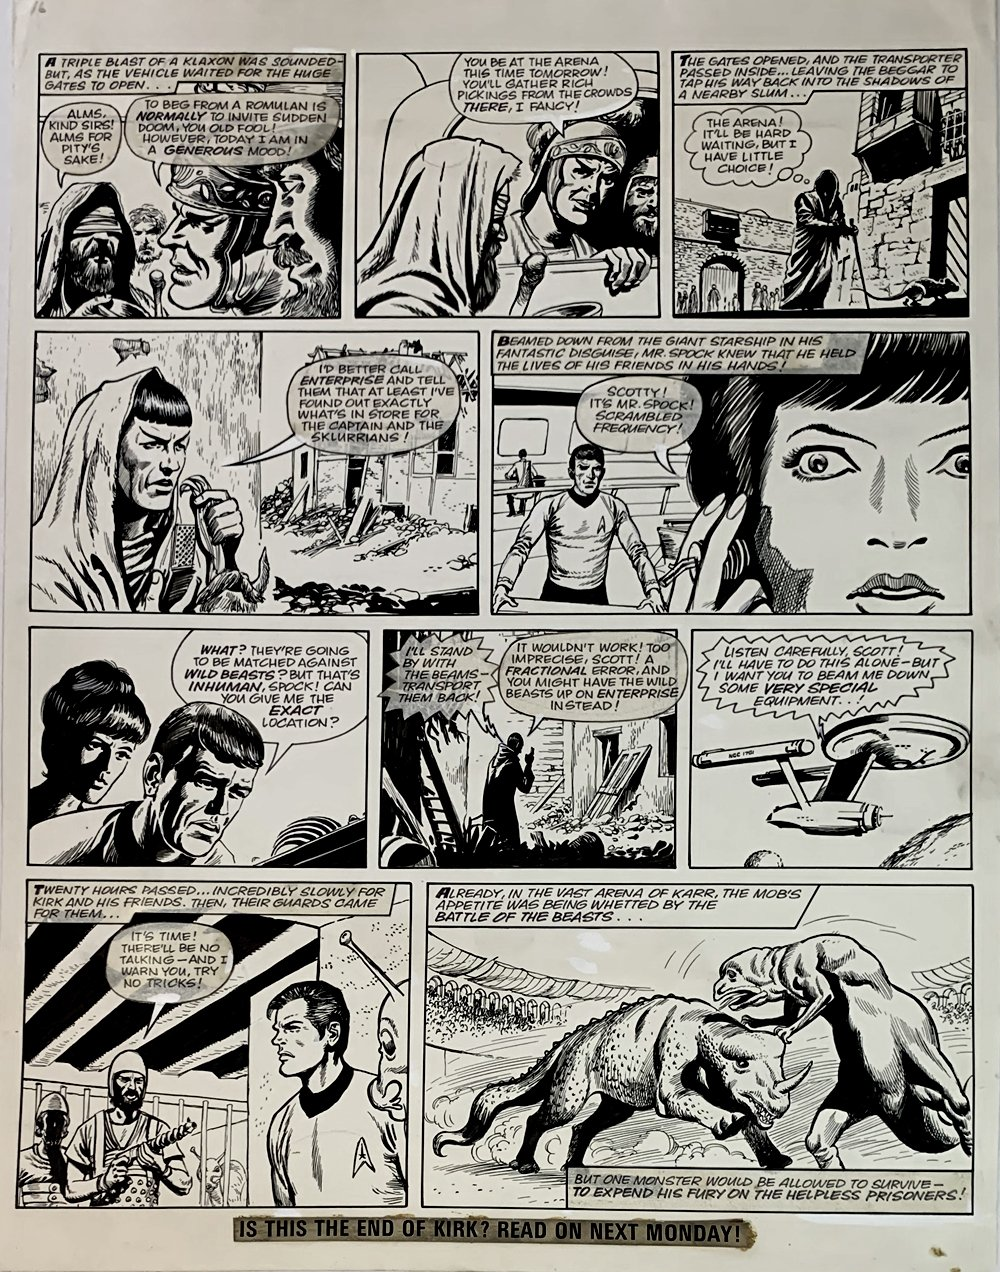 Star Trek Newspaper Strip 8-11-1973 (VERY LARGE)